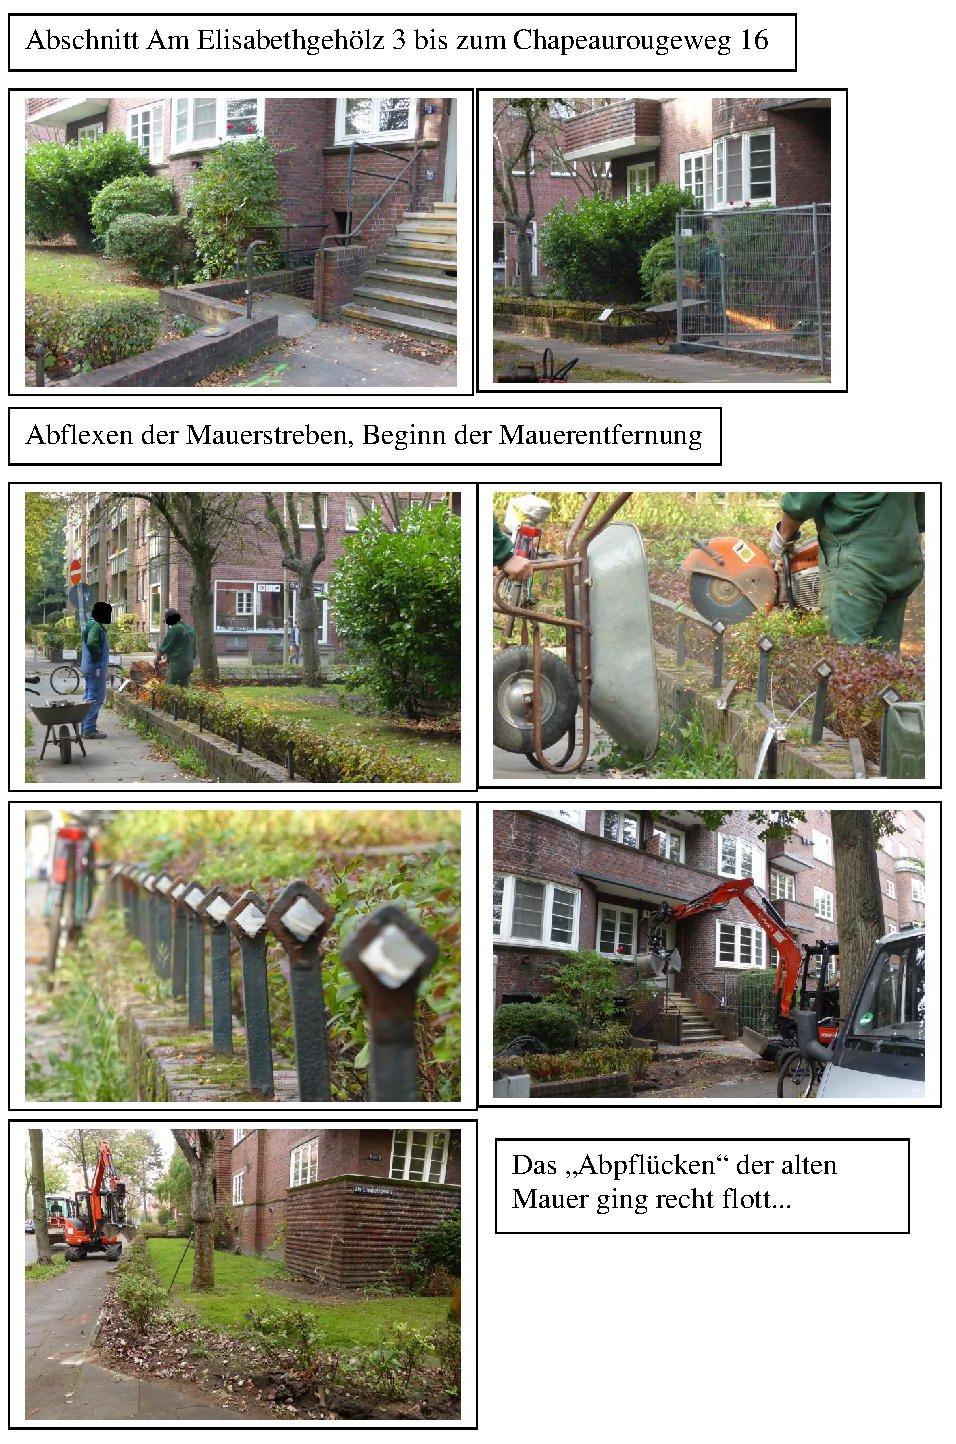 6 Elisabethgehölz 3- Chapeaurougeweg 16